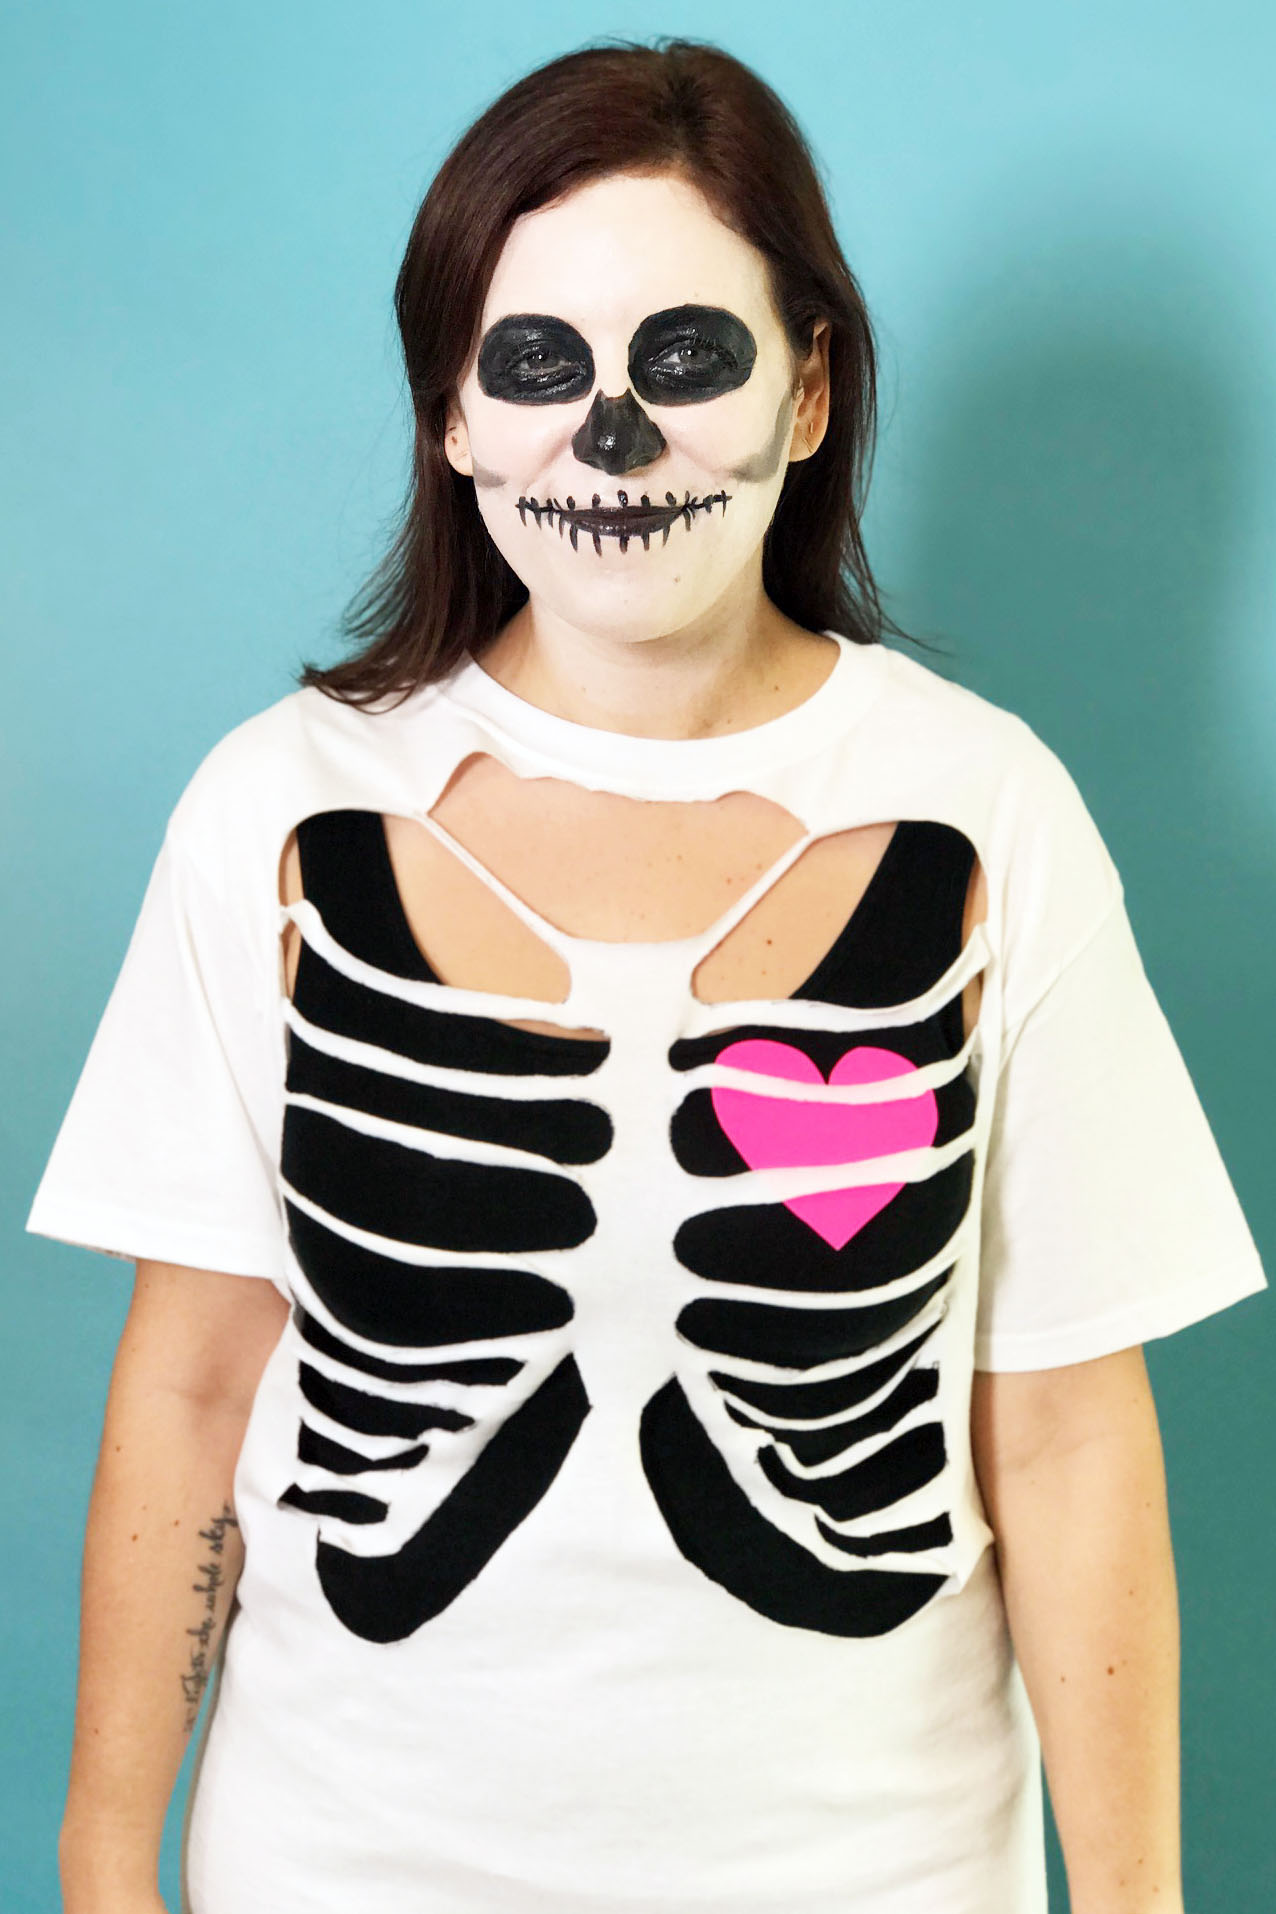 Easy Halloween Makeup: 40 Homemade Halloween Costumes For Adults & Kids